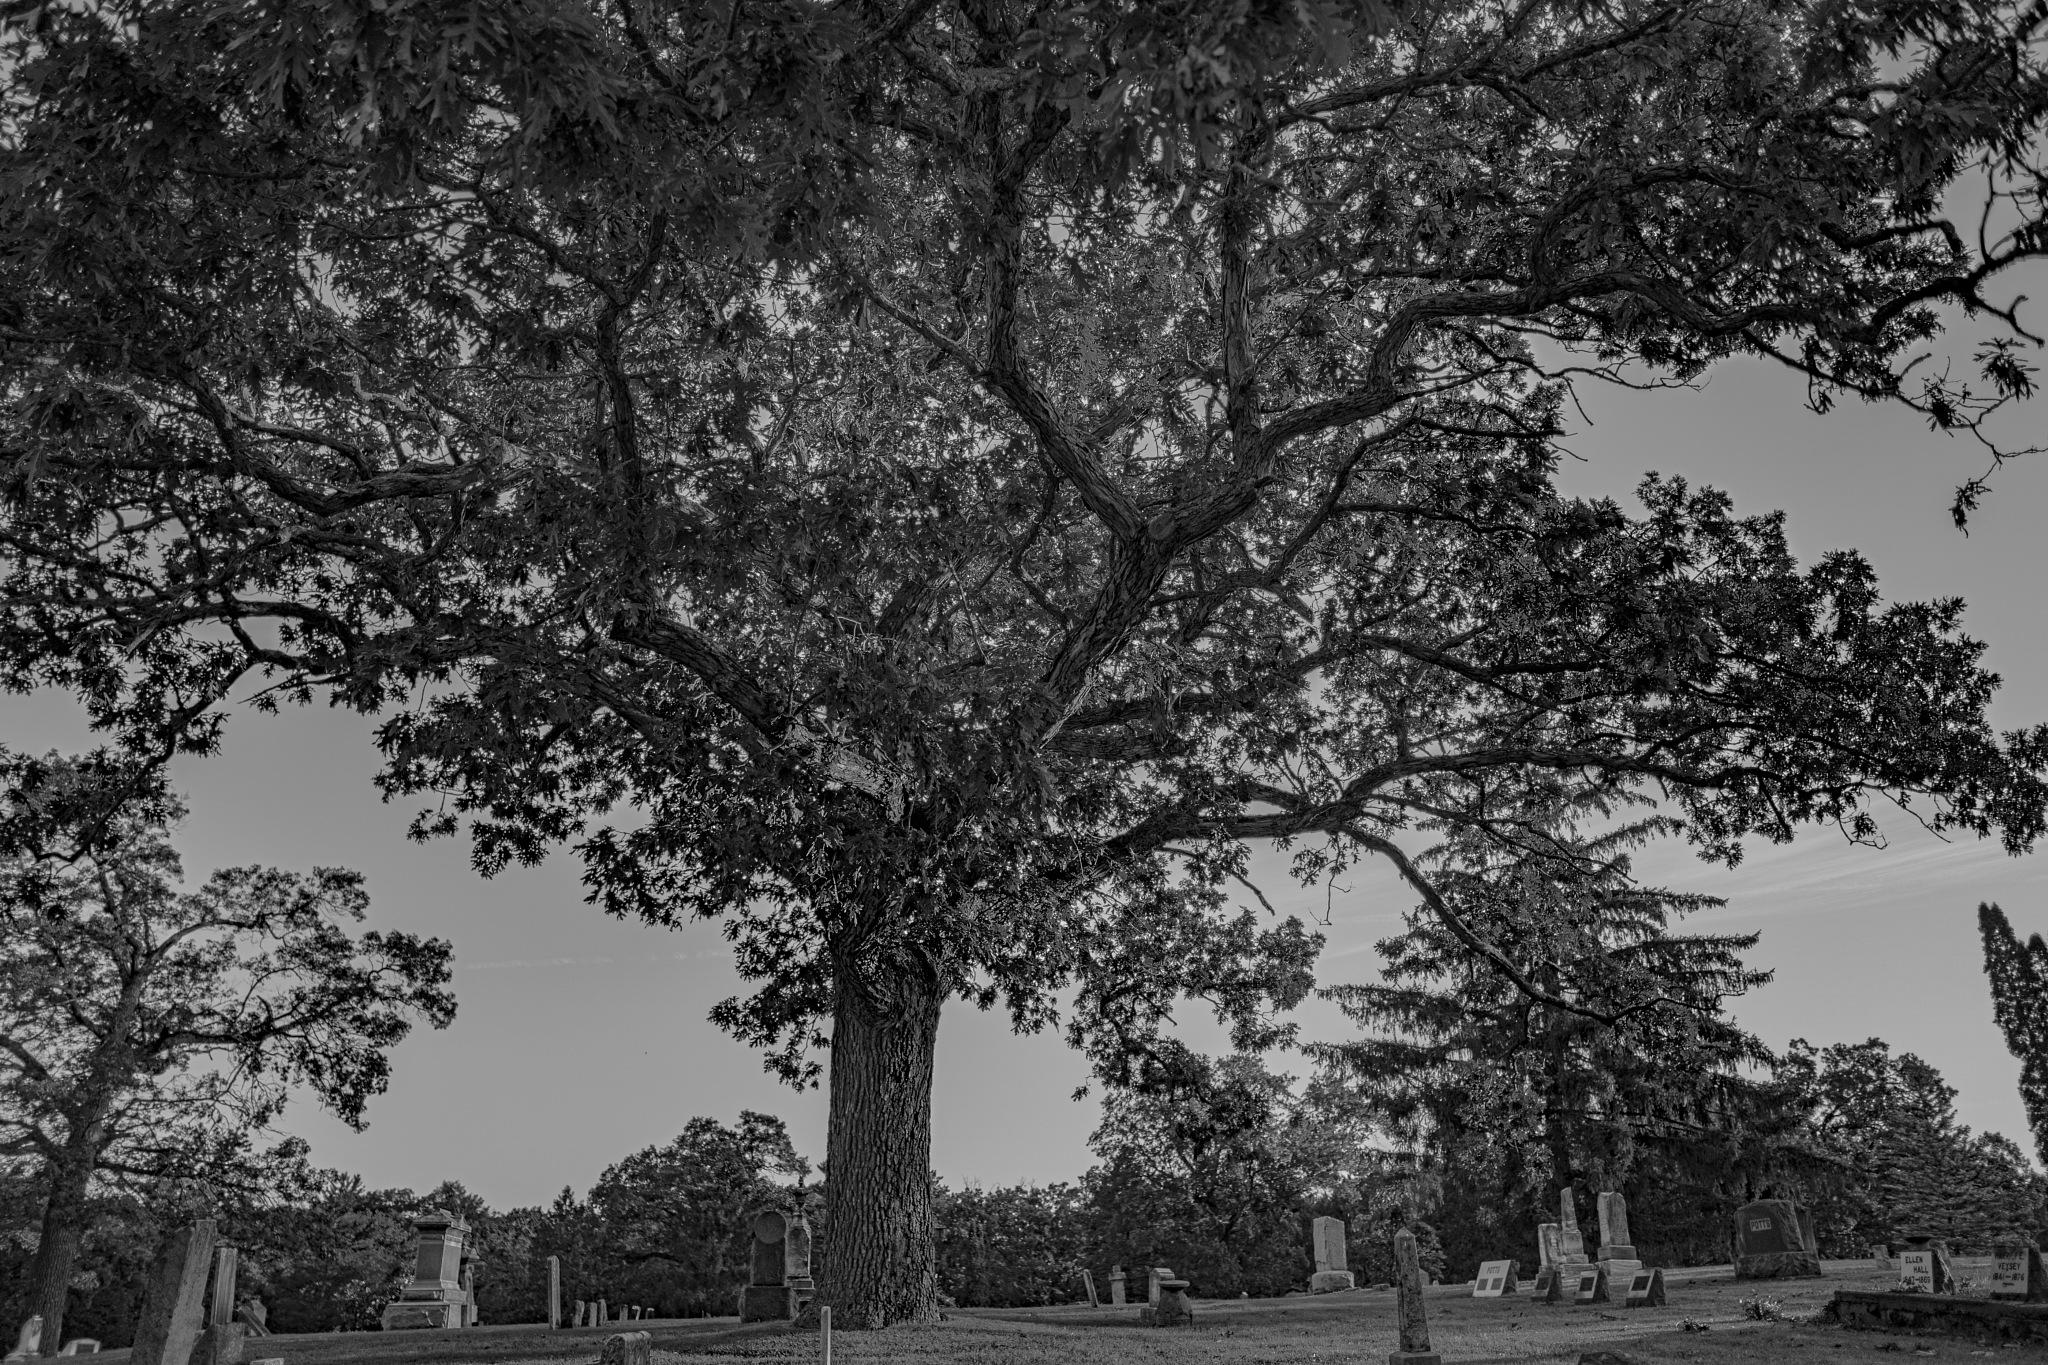 The Tree by Justin Wavruk